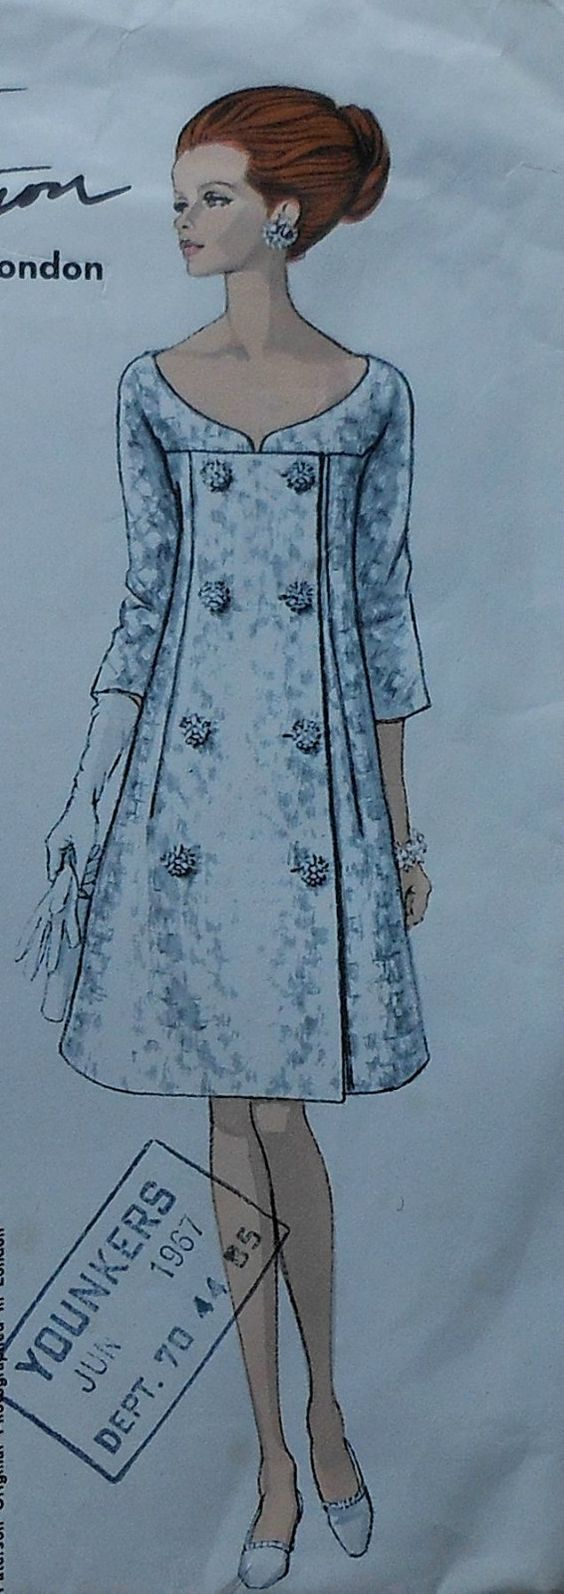 Платье 40-50х